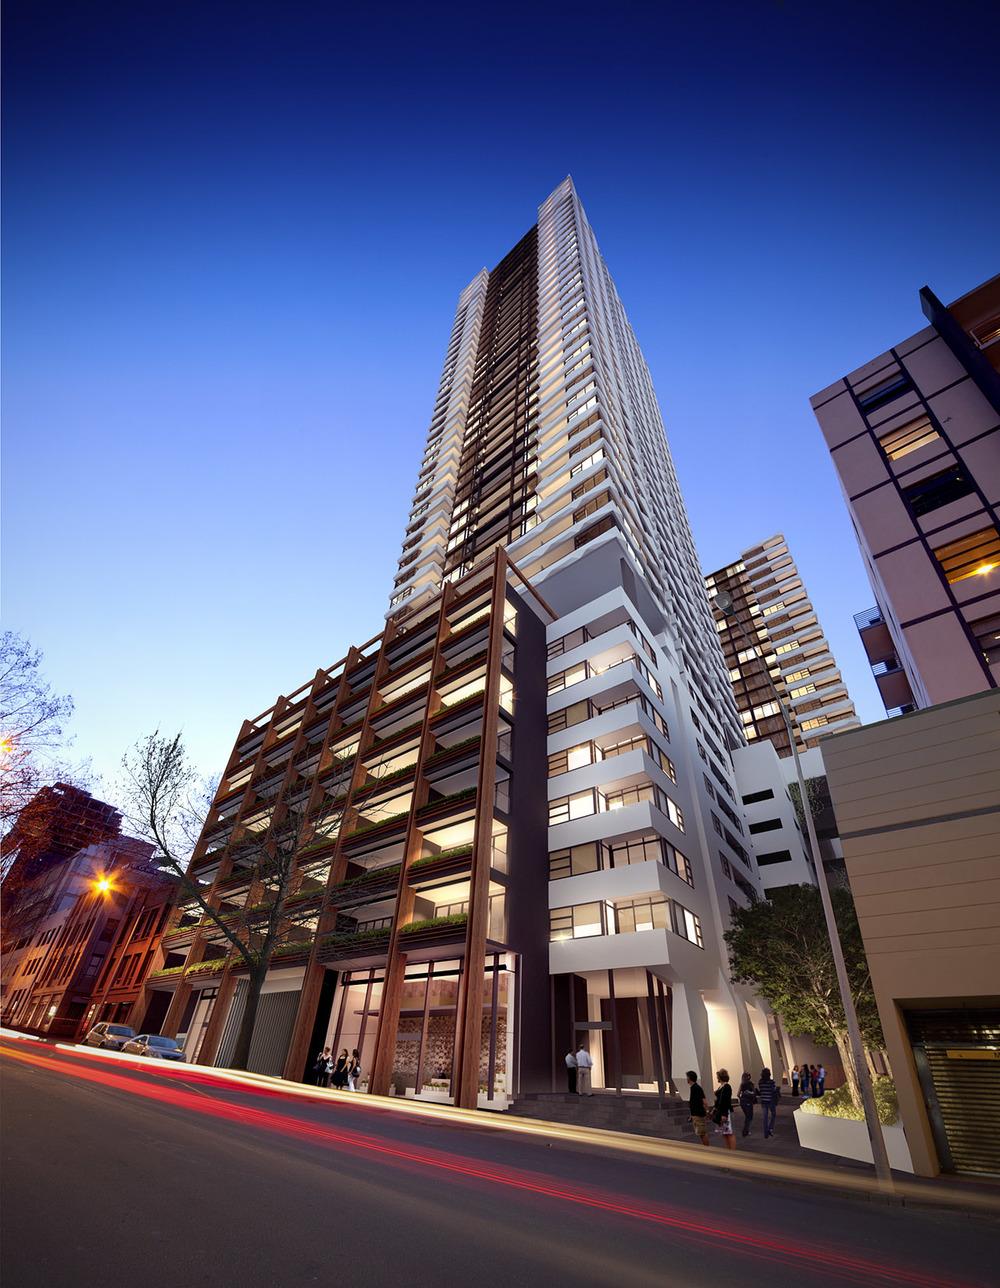 fulton lane apartments